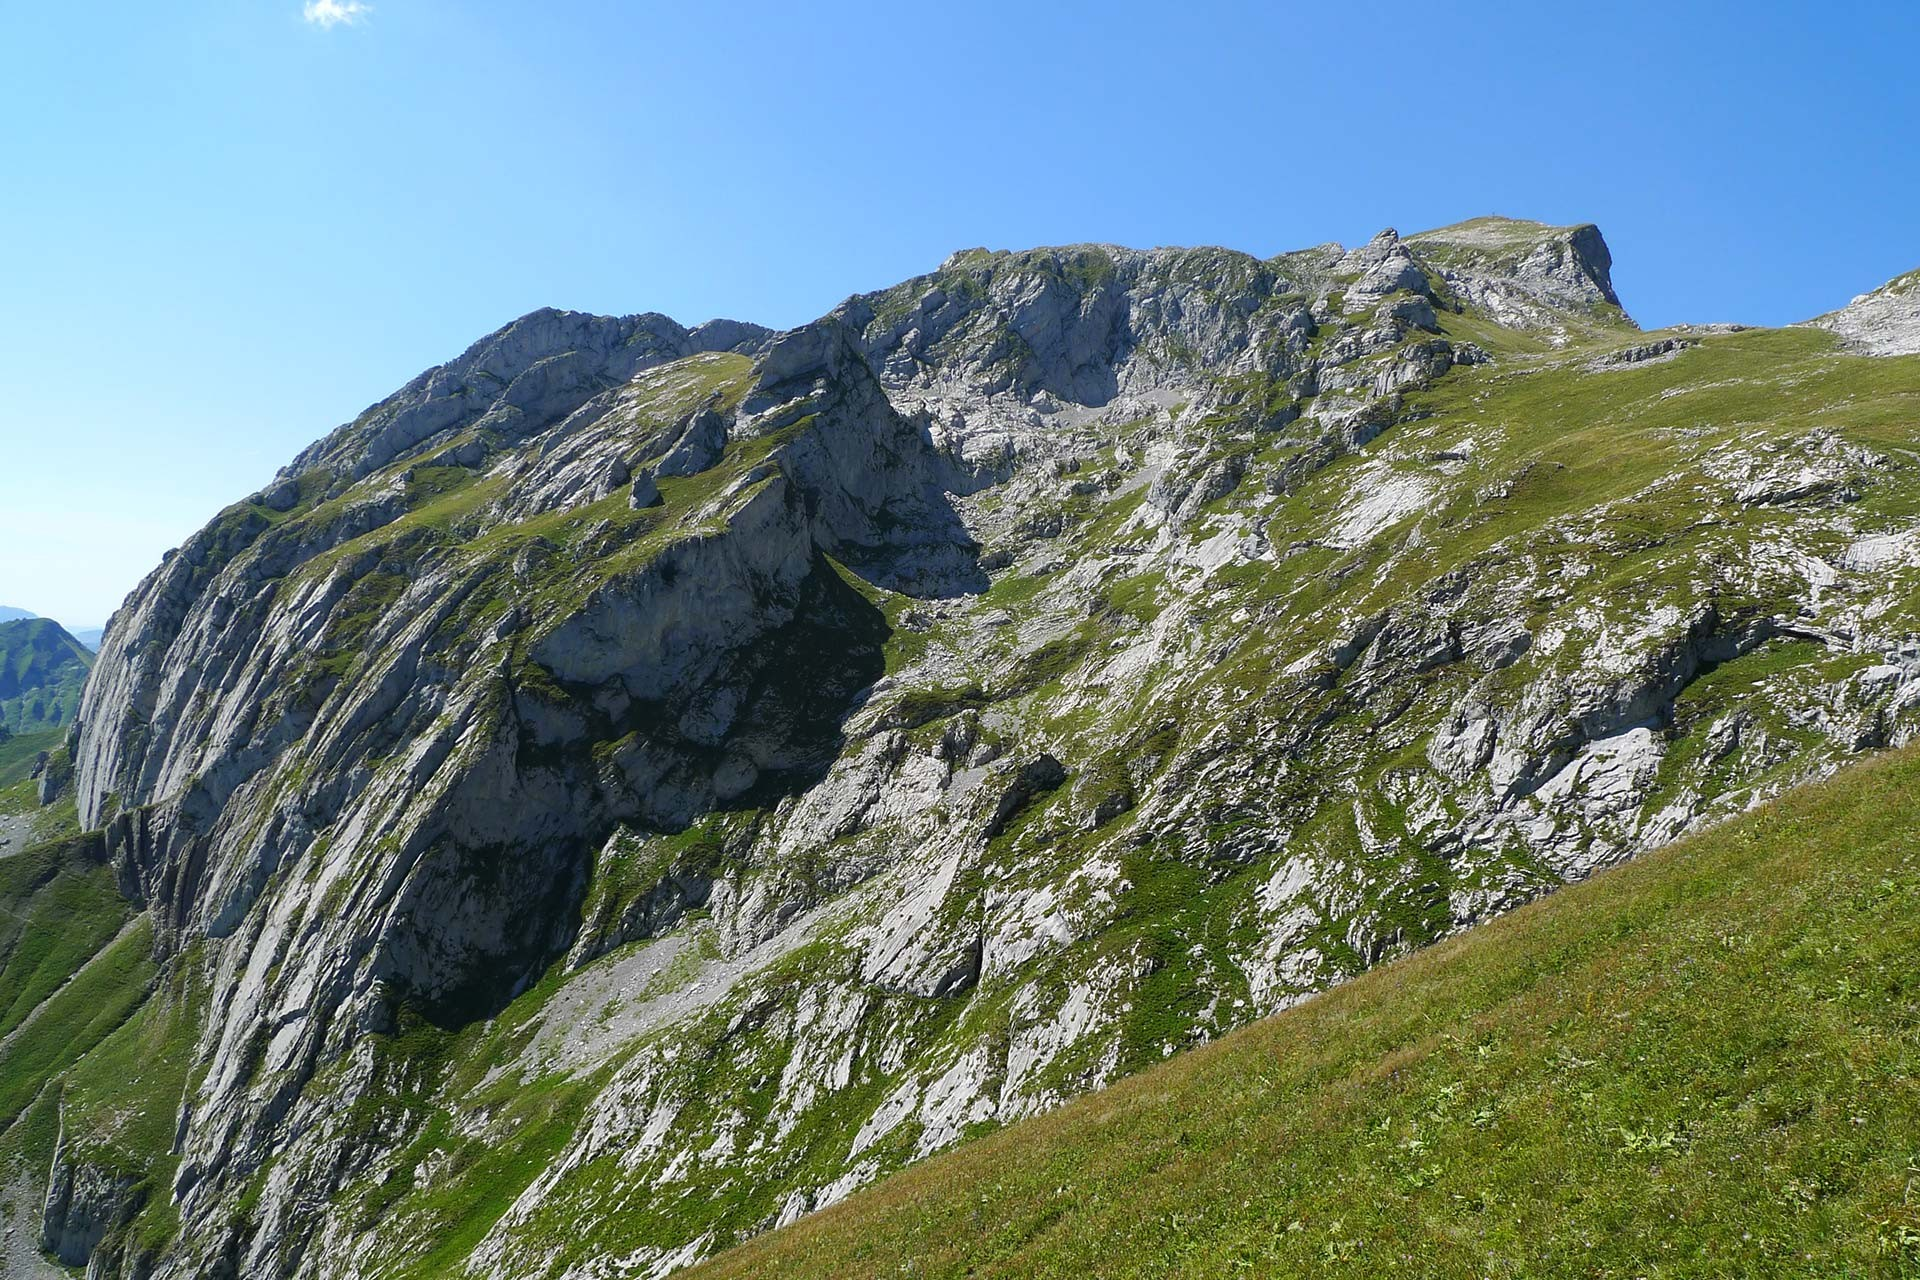 Alpinisme, hooggebergte